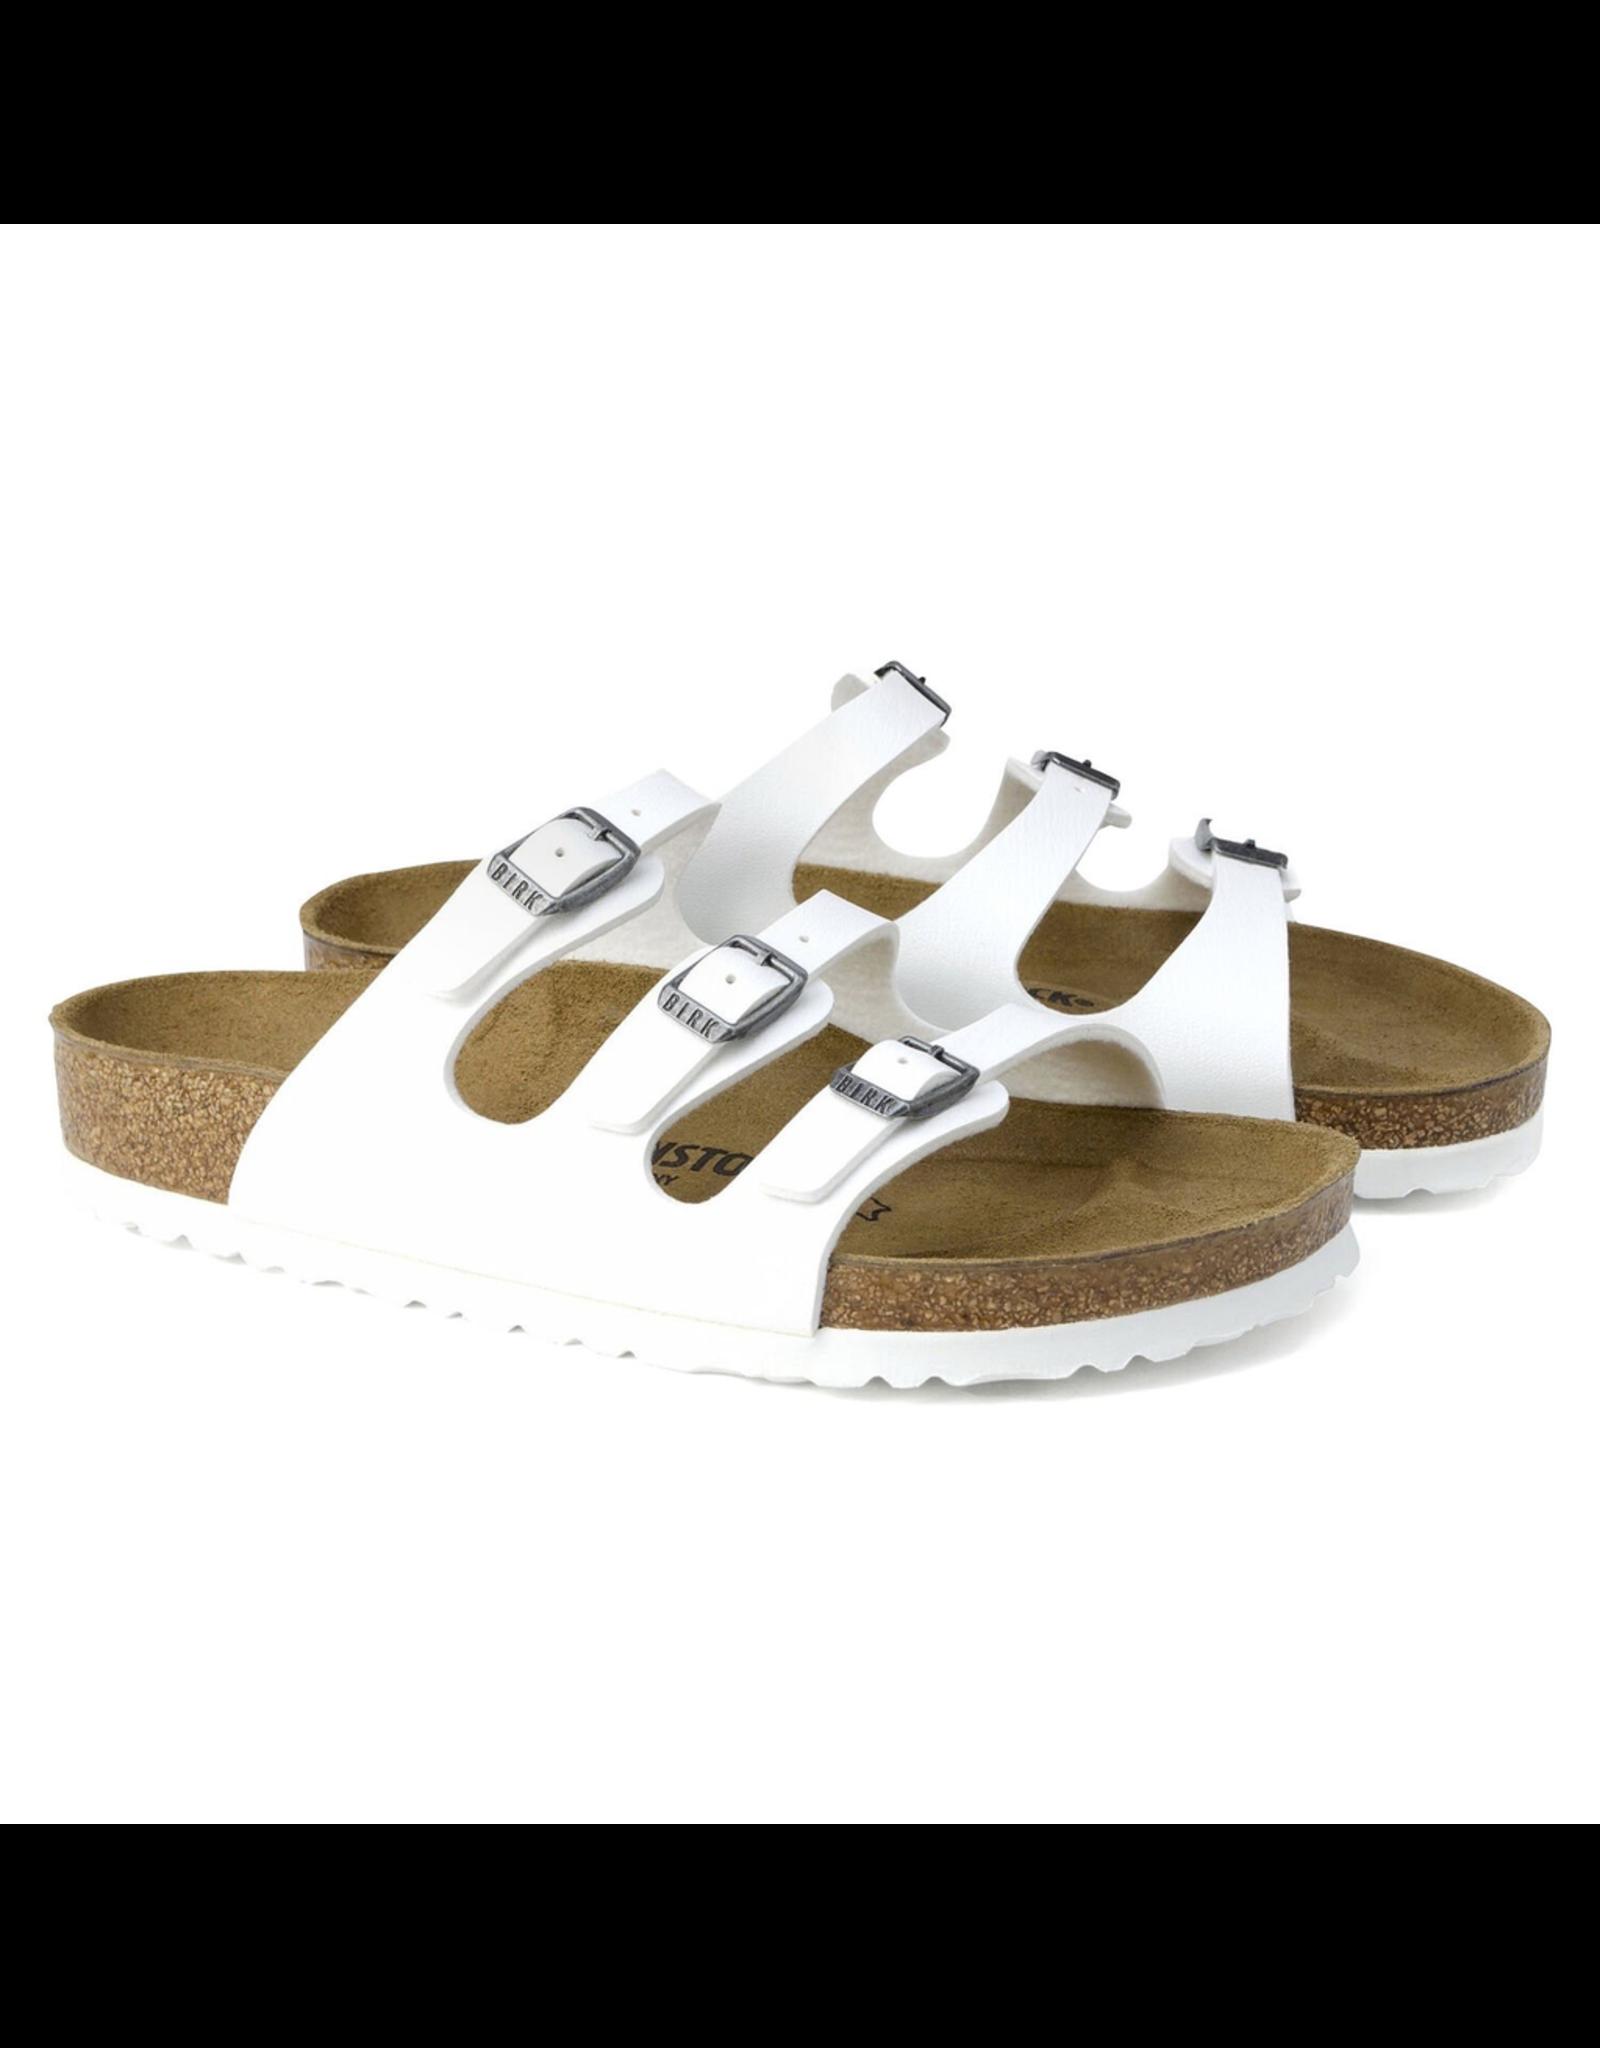 Birkenstock Florida Sandal Birko-Flor - COV40613